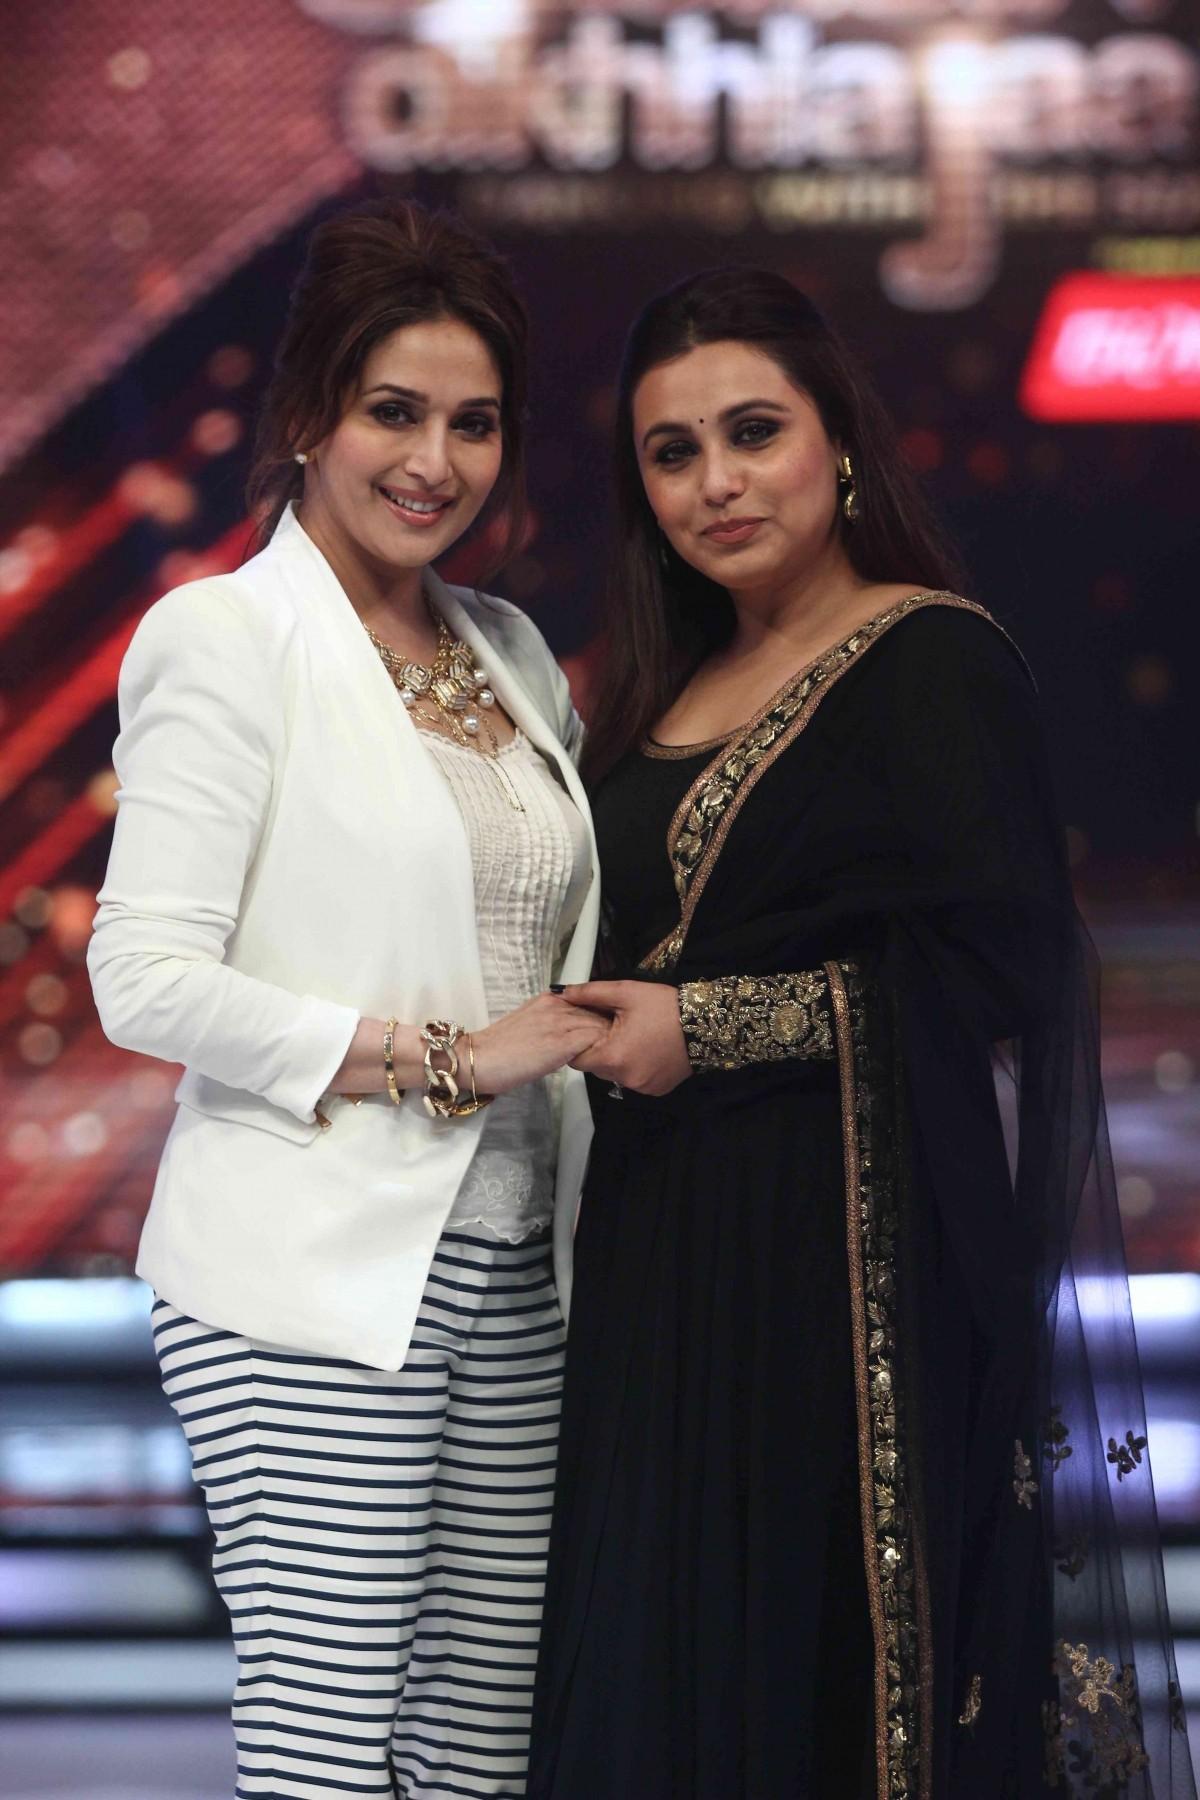 Rani promotes 'Mardaani' on 'Jhalak Dikhhla Jaa'